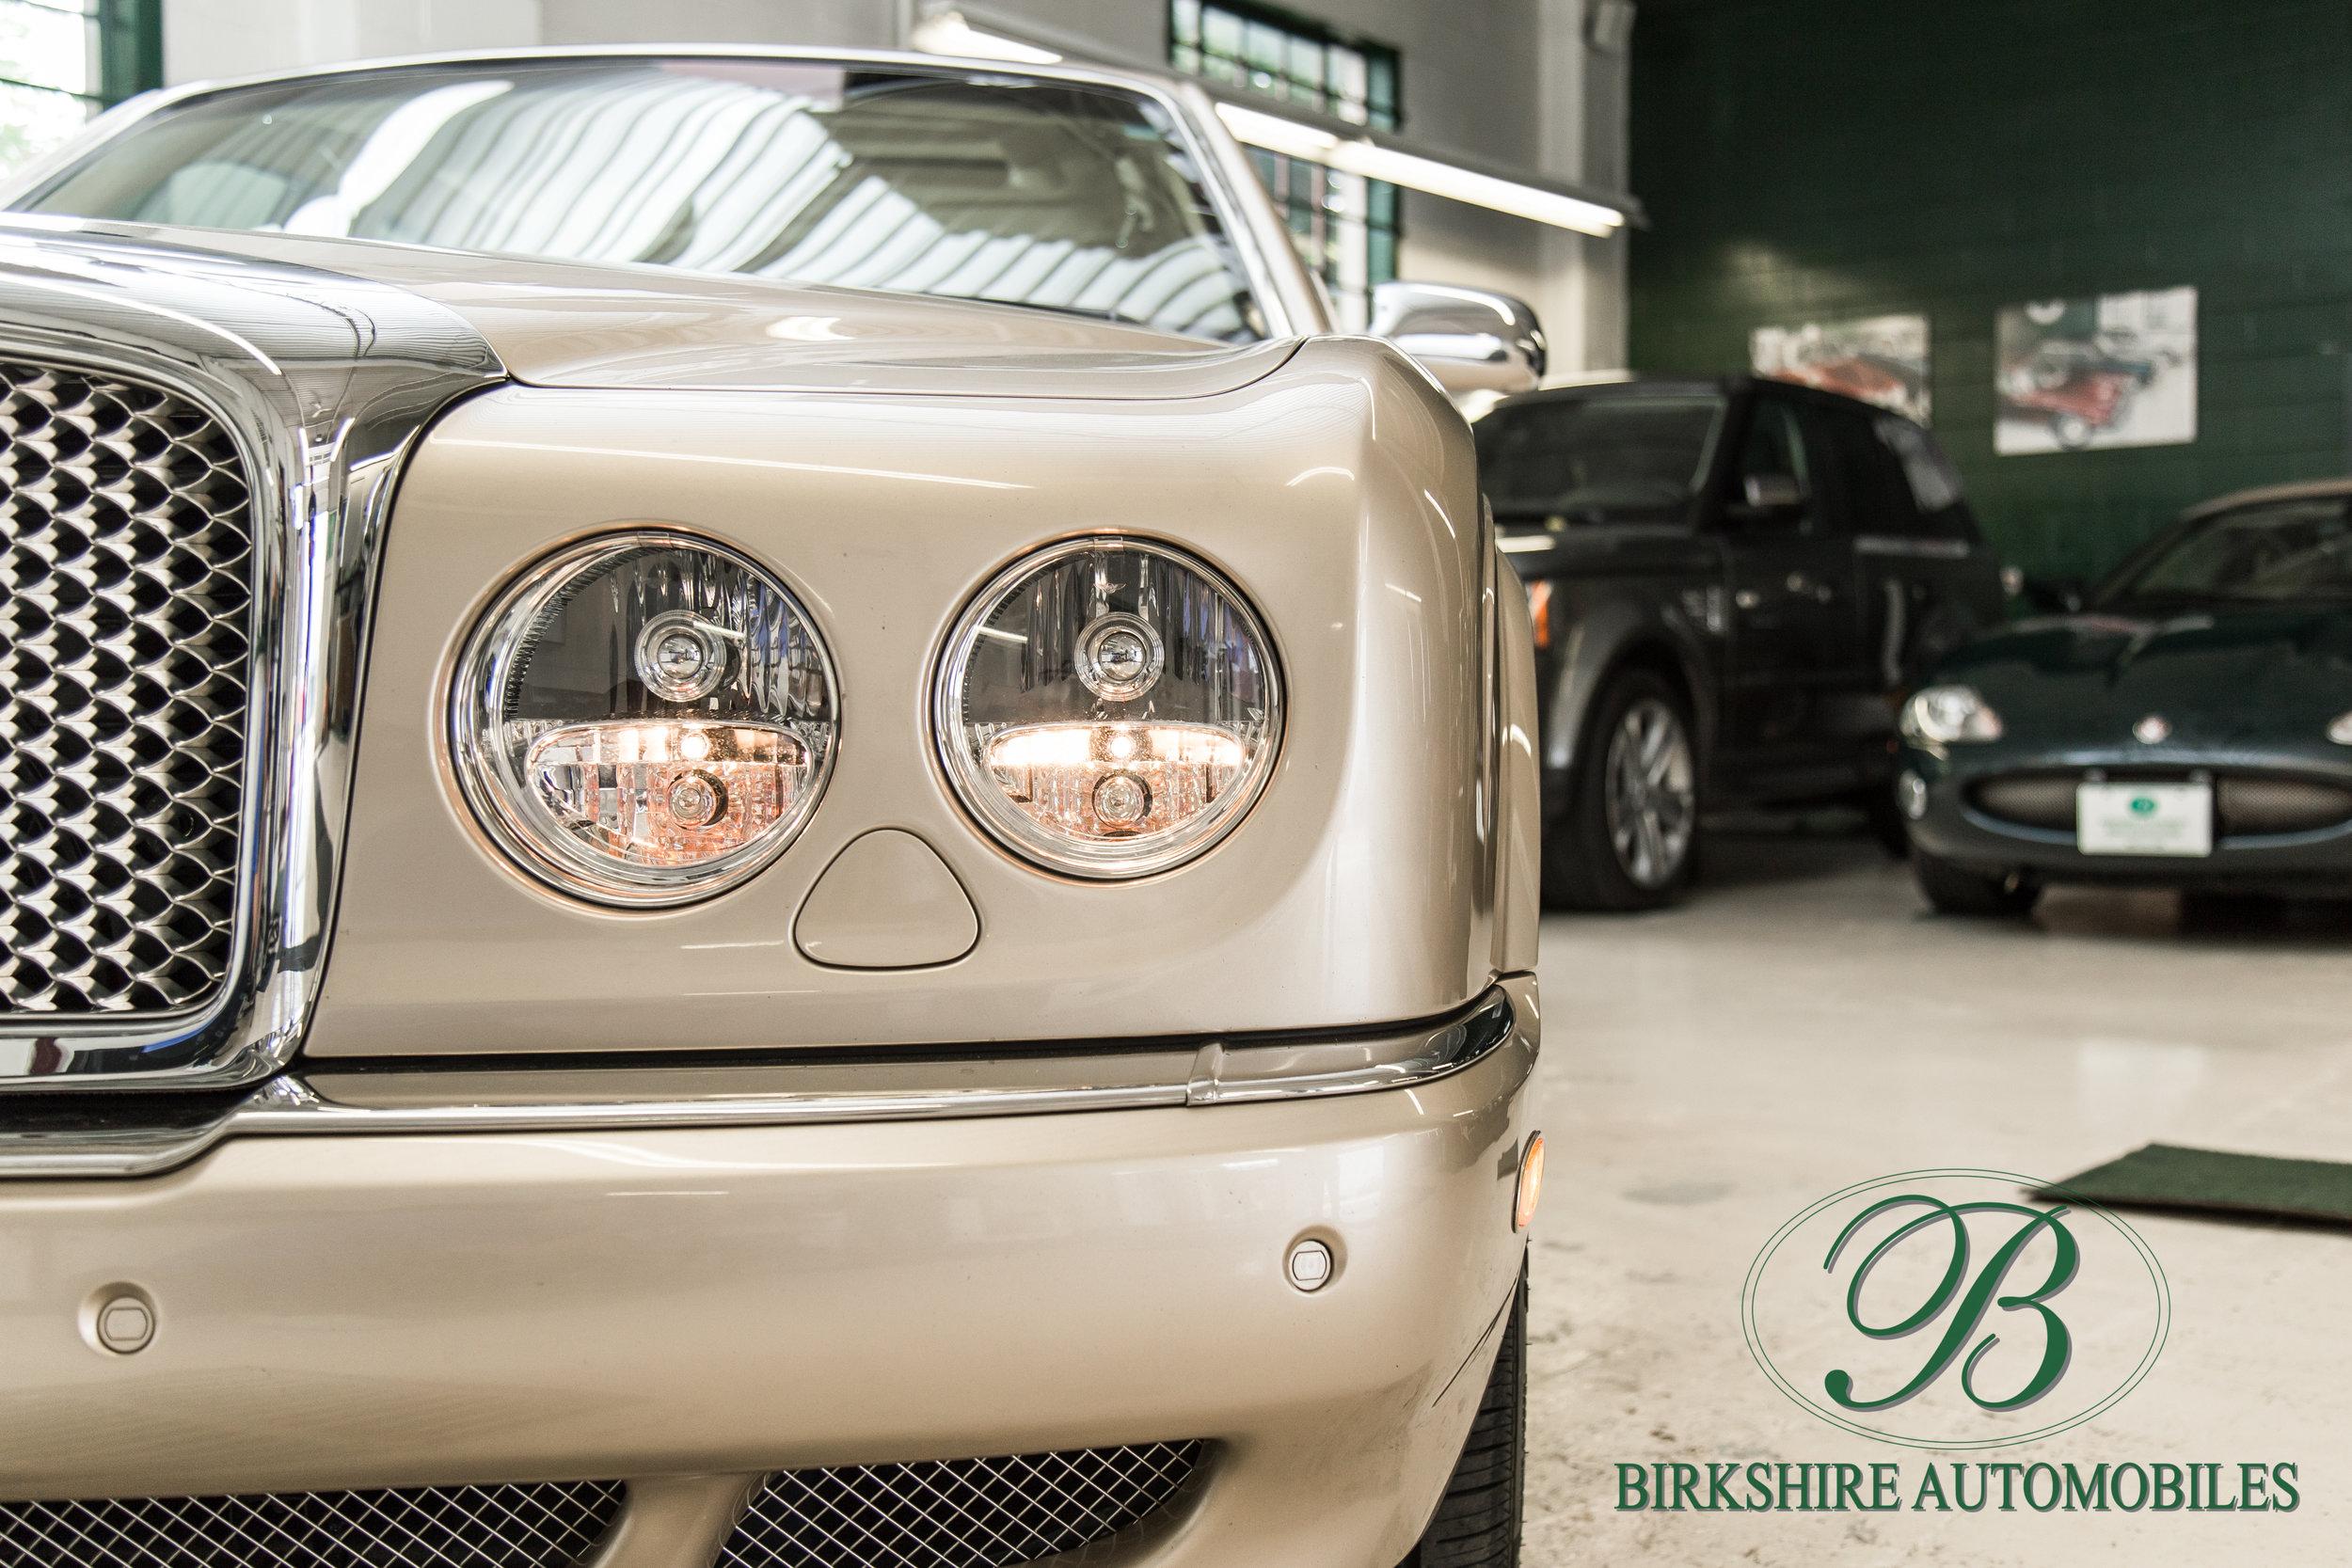 Birkshire Automobiles-321.jpg